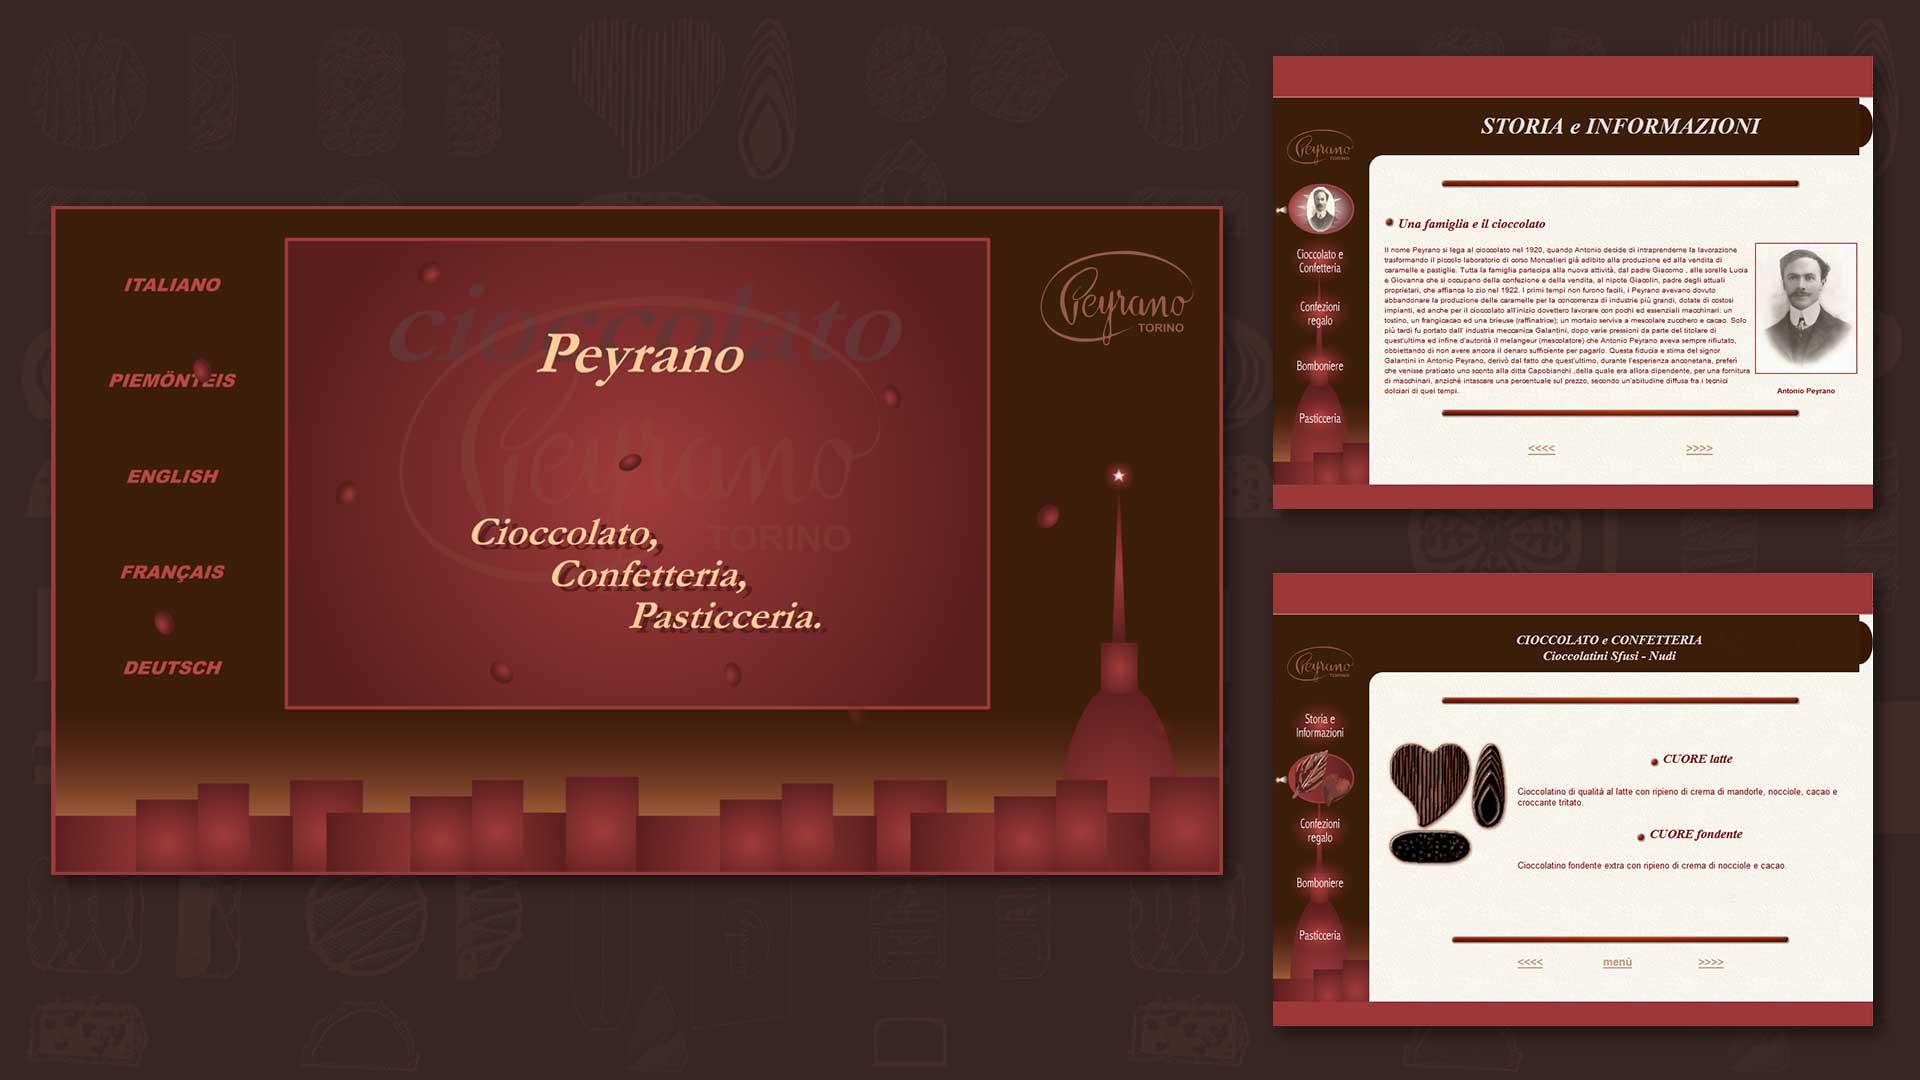 Cioccolato Peyrano